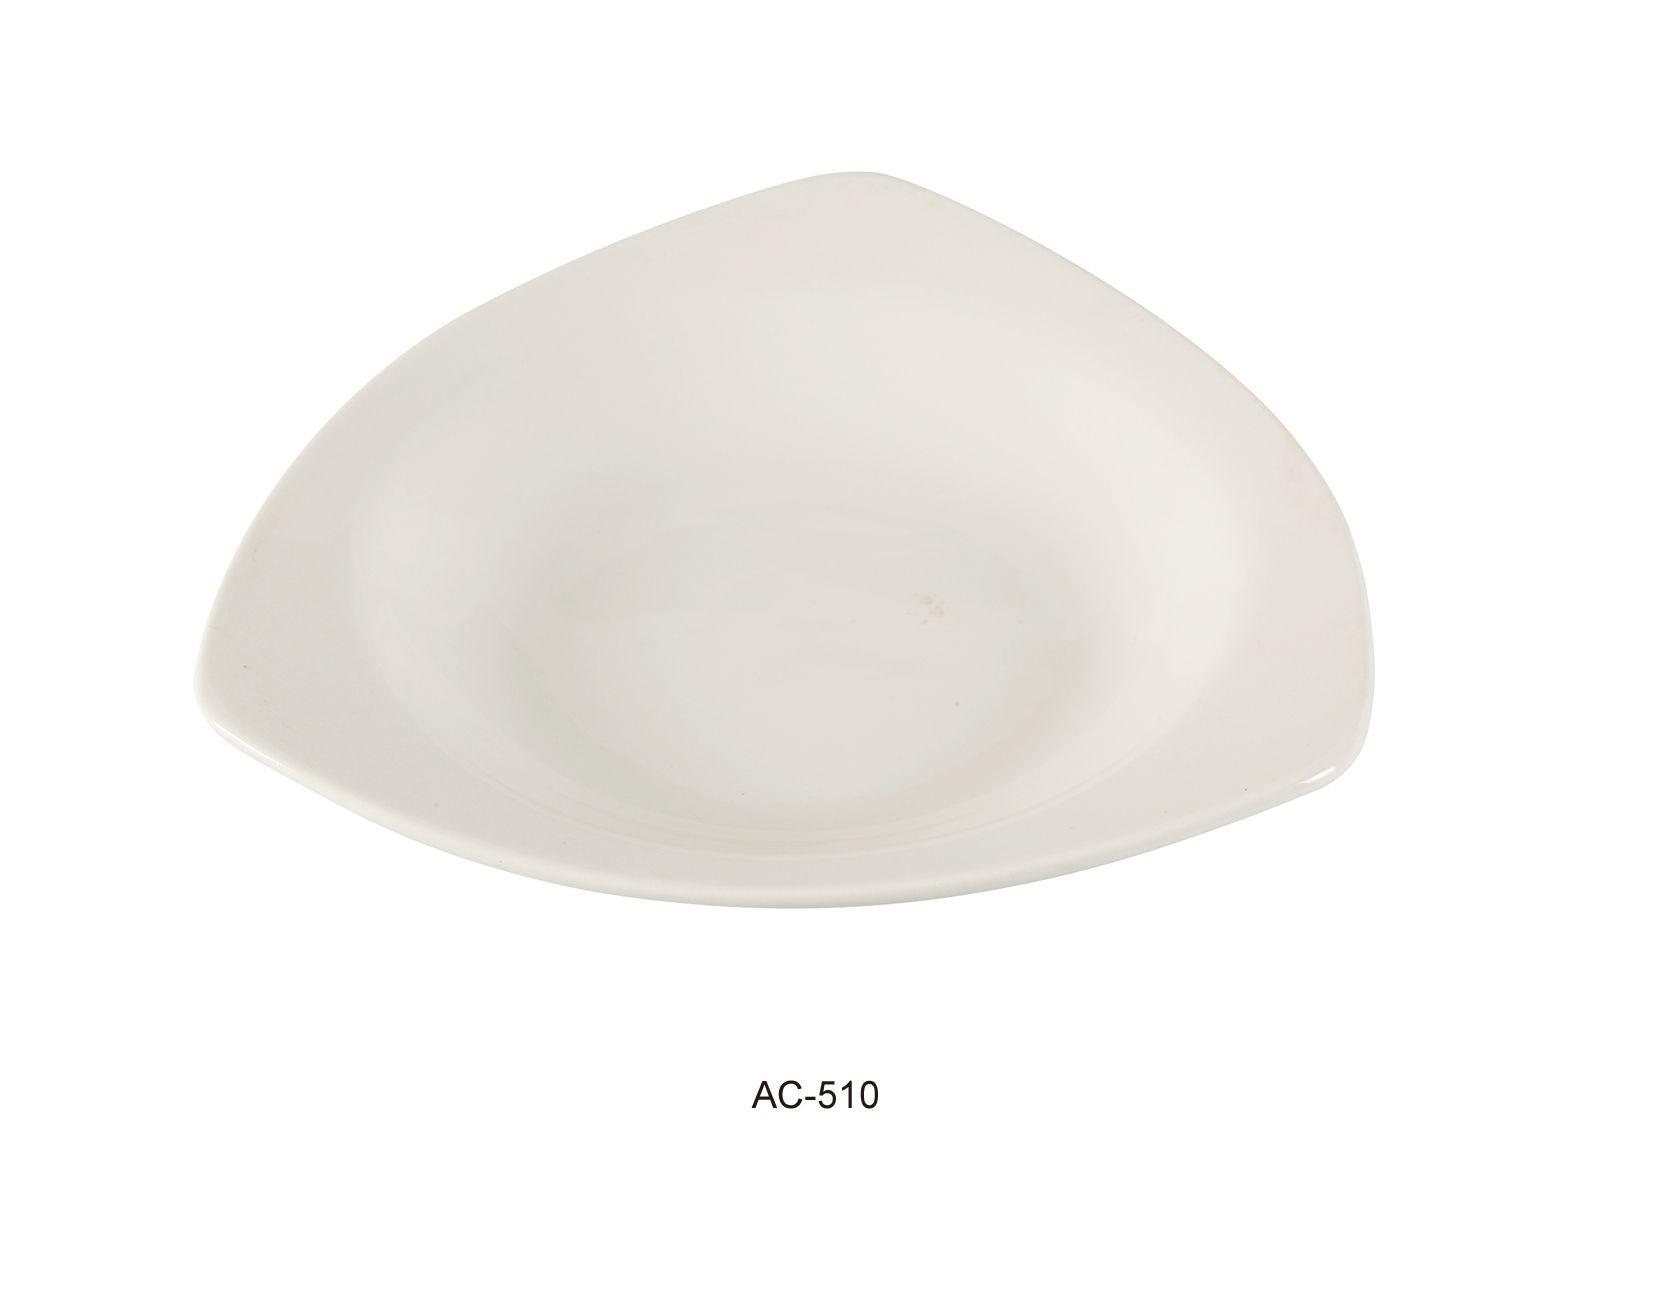 "Yanco AC-510 Abco 10 1/2"" Triangle Pasta Bowl 22 oz."